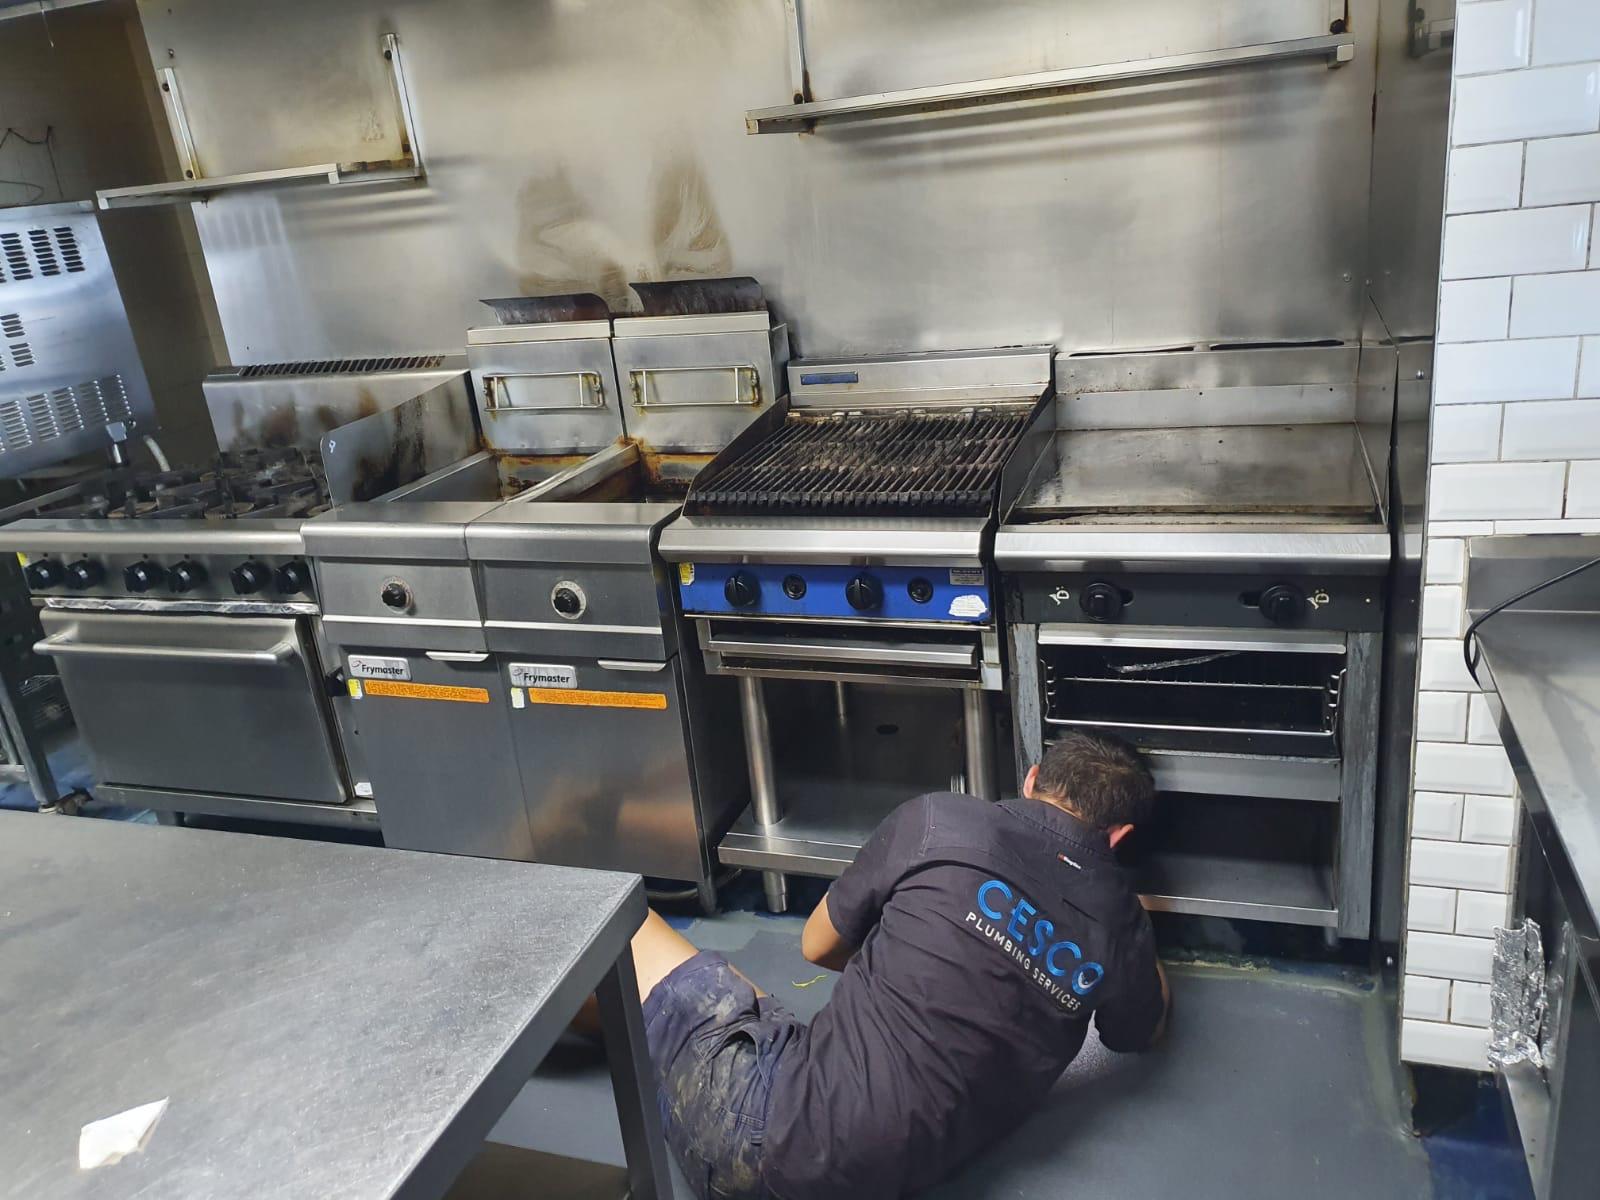 plumber repairing commercial kitchen